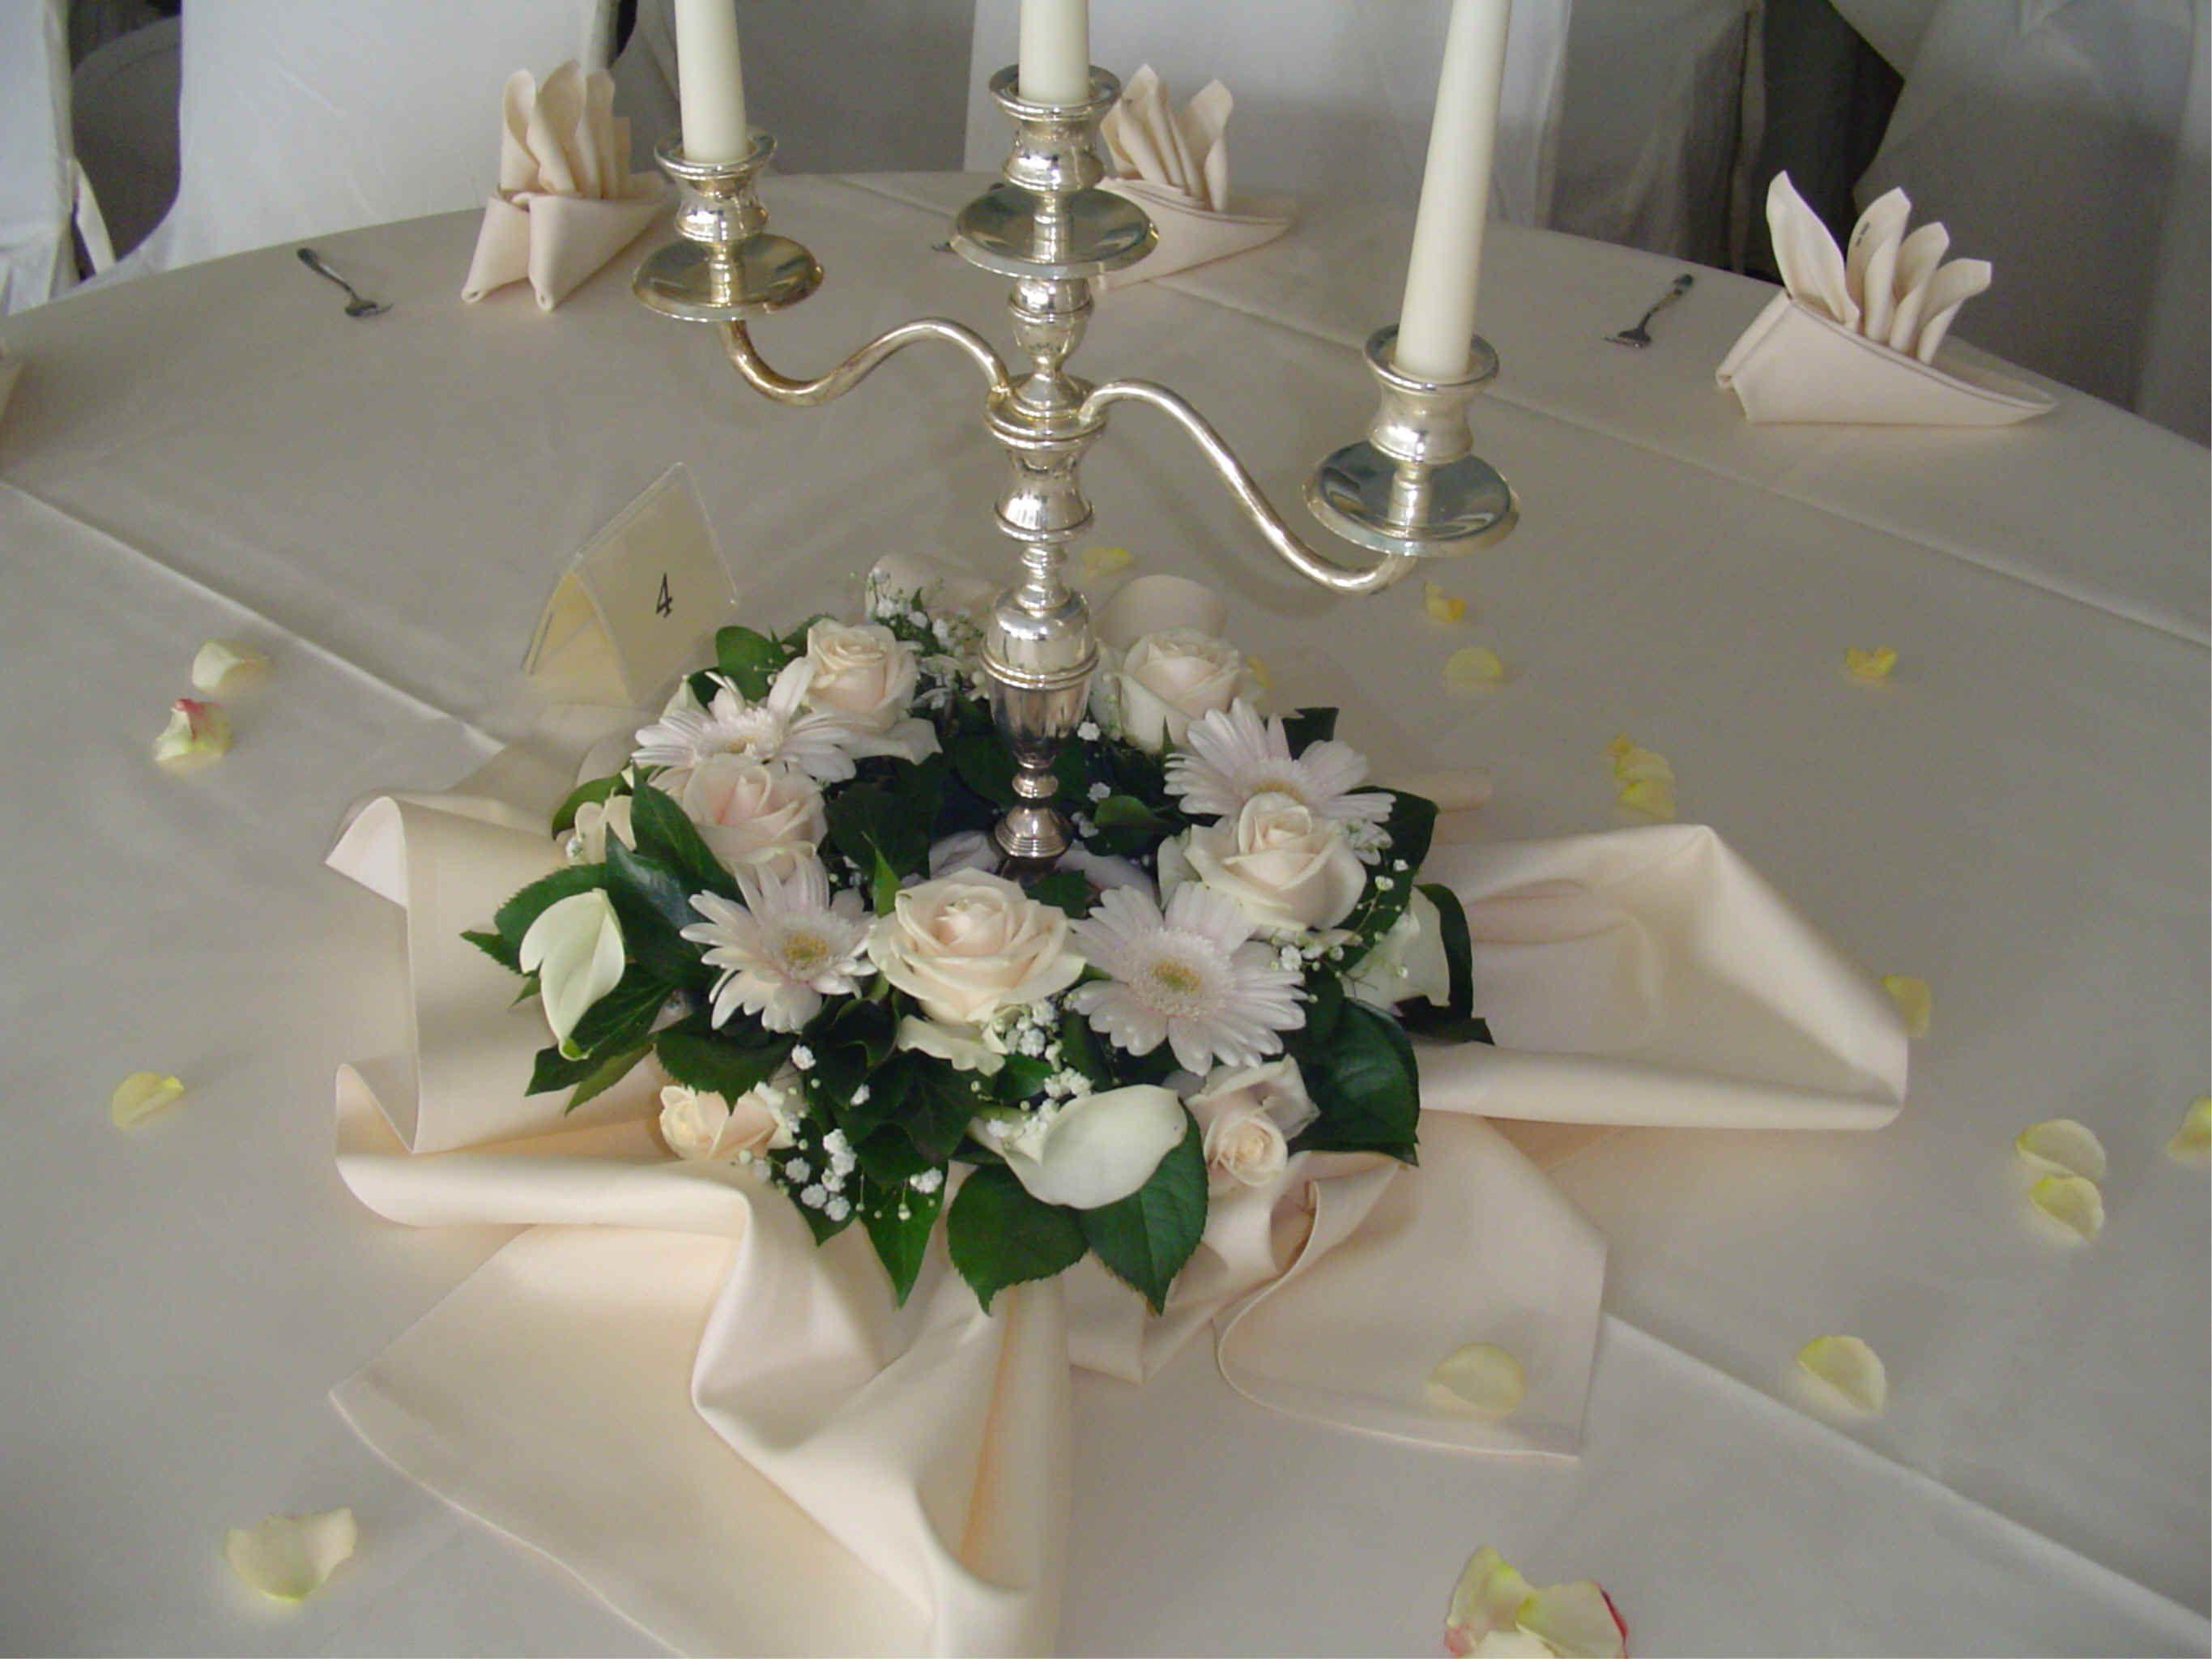 Tisch Blumen Hochzeit Festsaal Prestige De Luxe In Wiesbaden